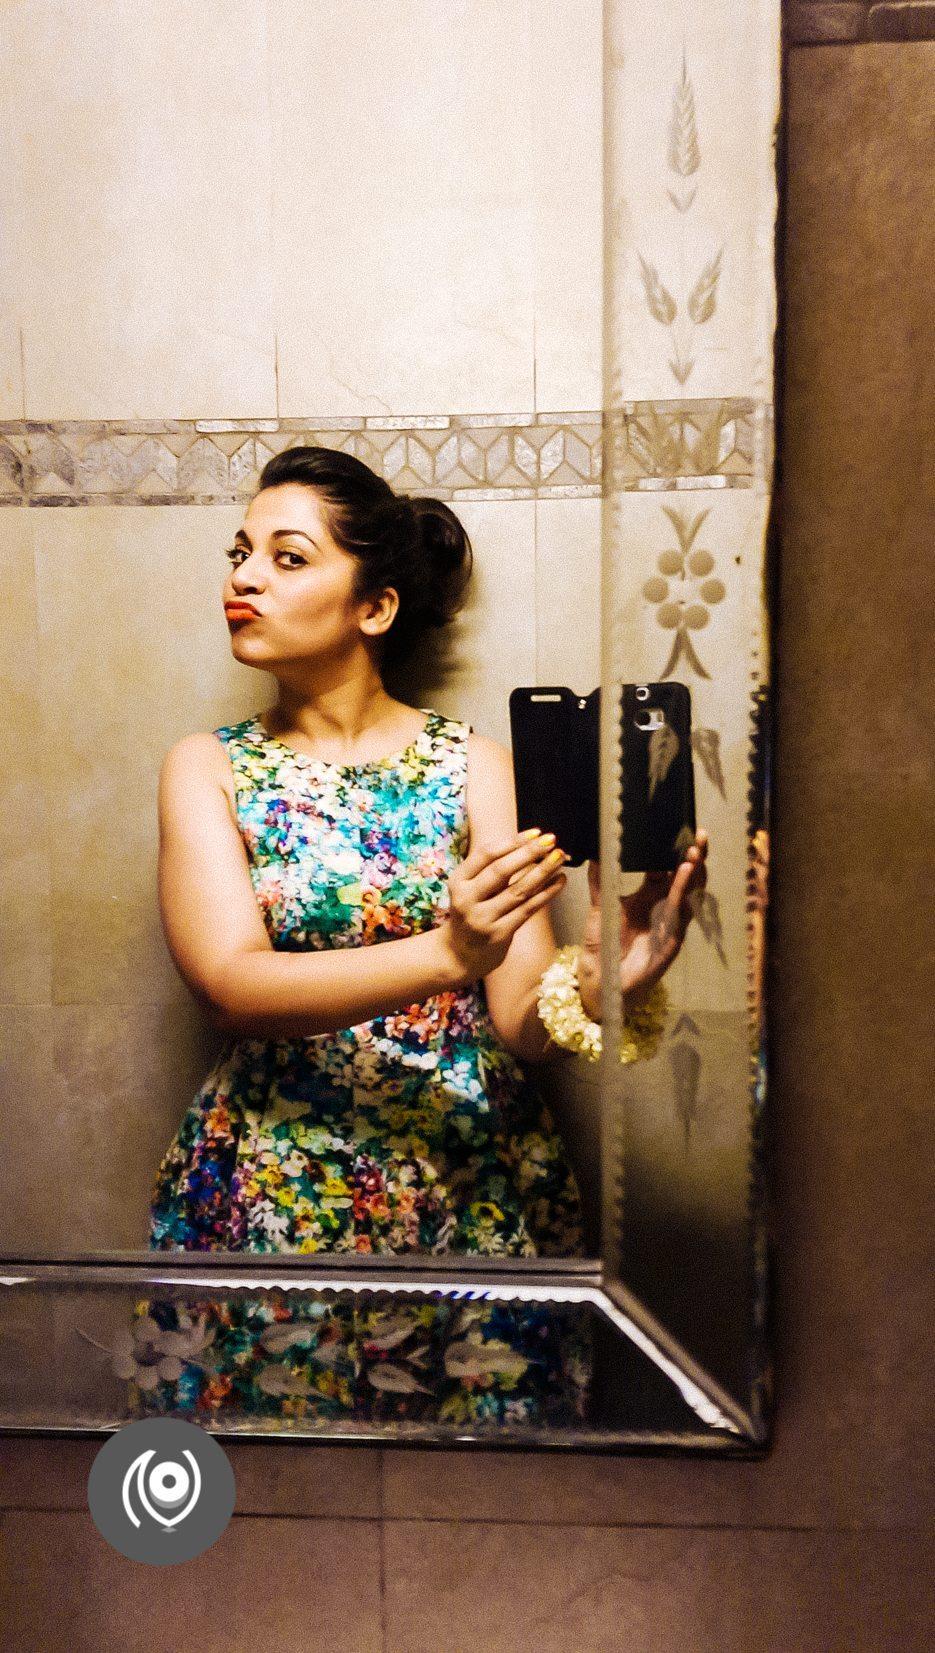 NainaCo-Luxury-Lifestyle-Raconteuse-Visuelle-Storyteller-Photographer-CoverUp-20-Floral-03